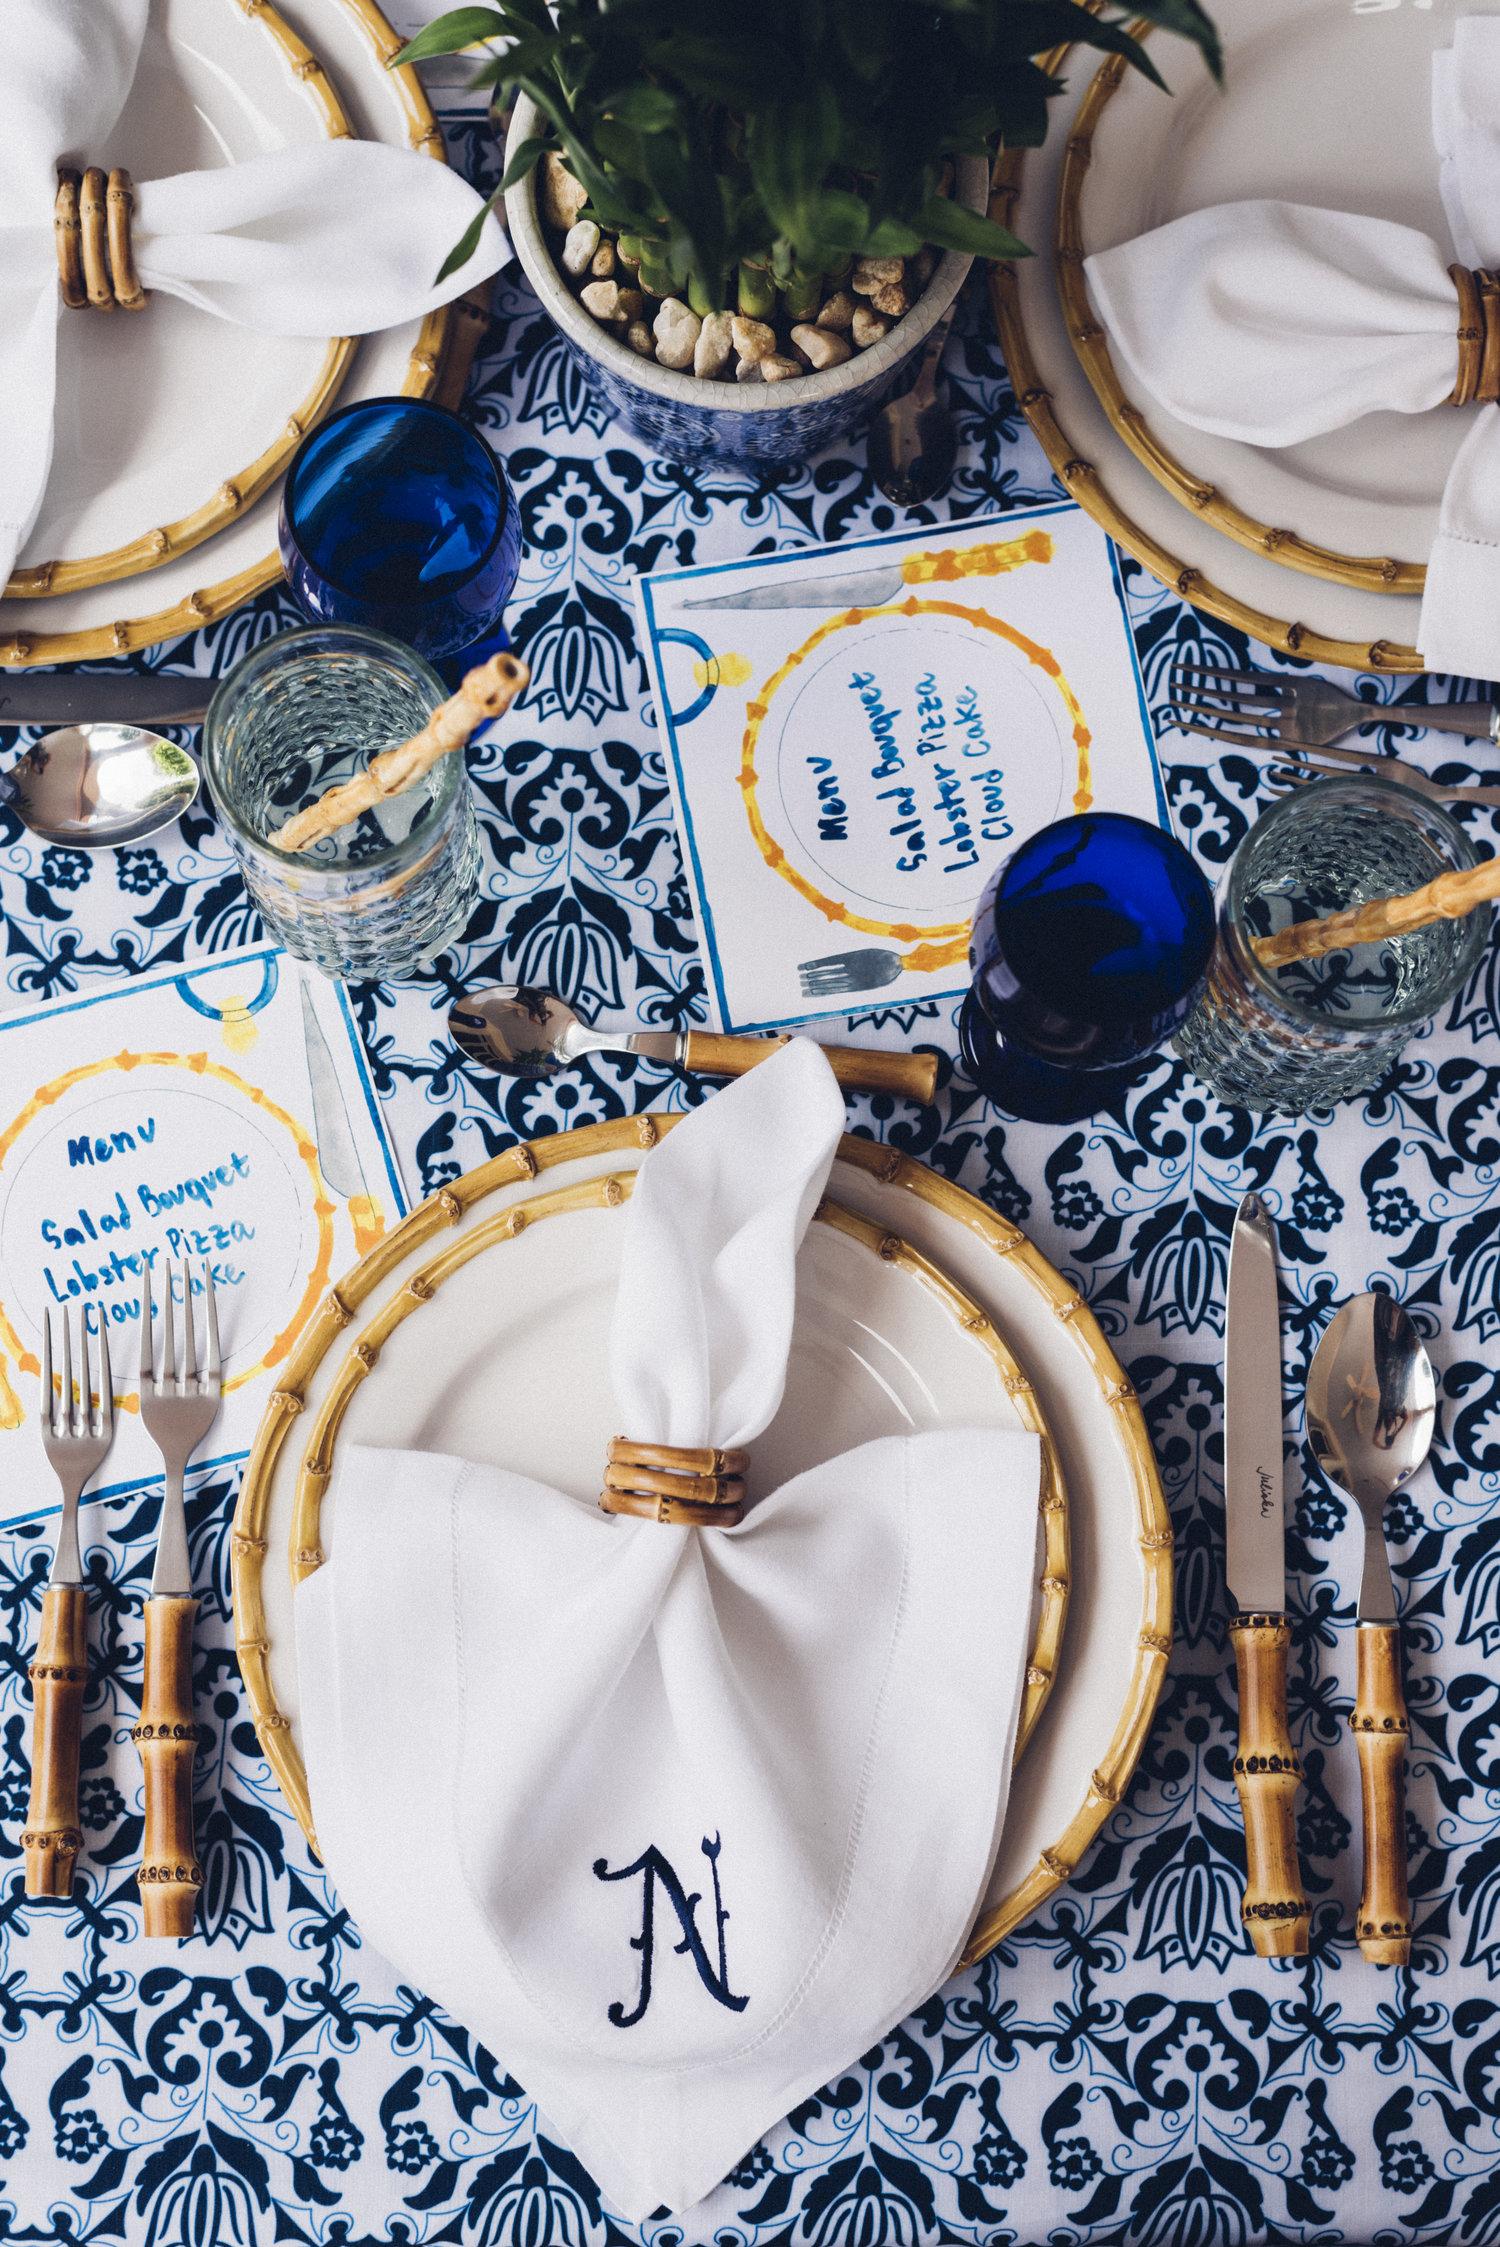 Chefanie's  Bamboo Napkin Rings , Ceramic Bamboo Straws , and  Custom Embroidered Napkin